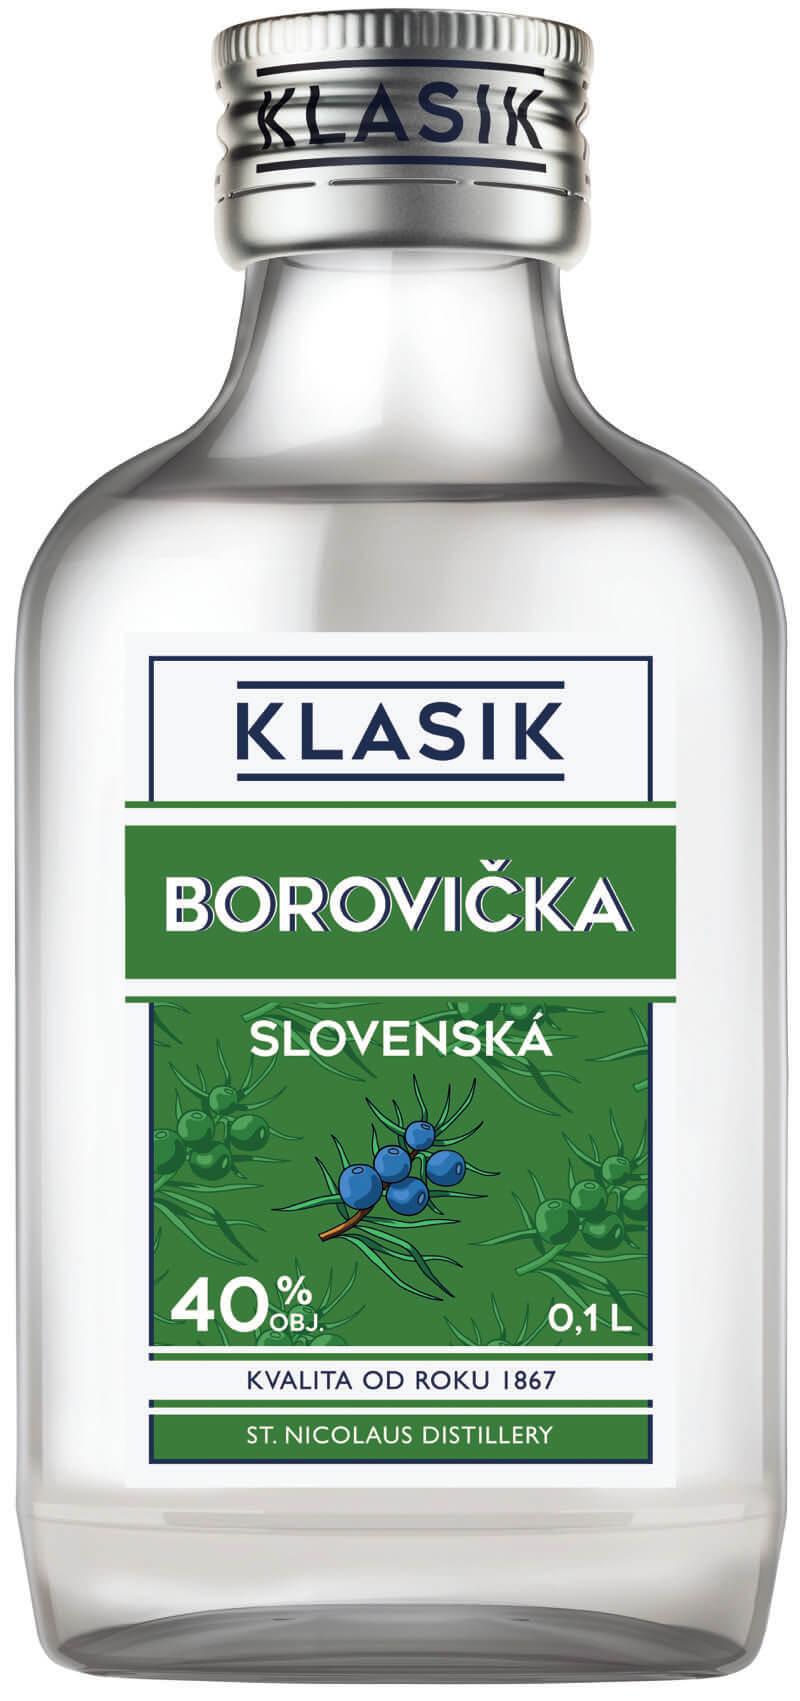 KLASIK Slovenská borovička 40% 0,1 l